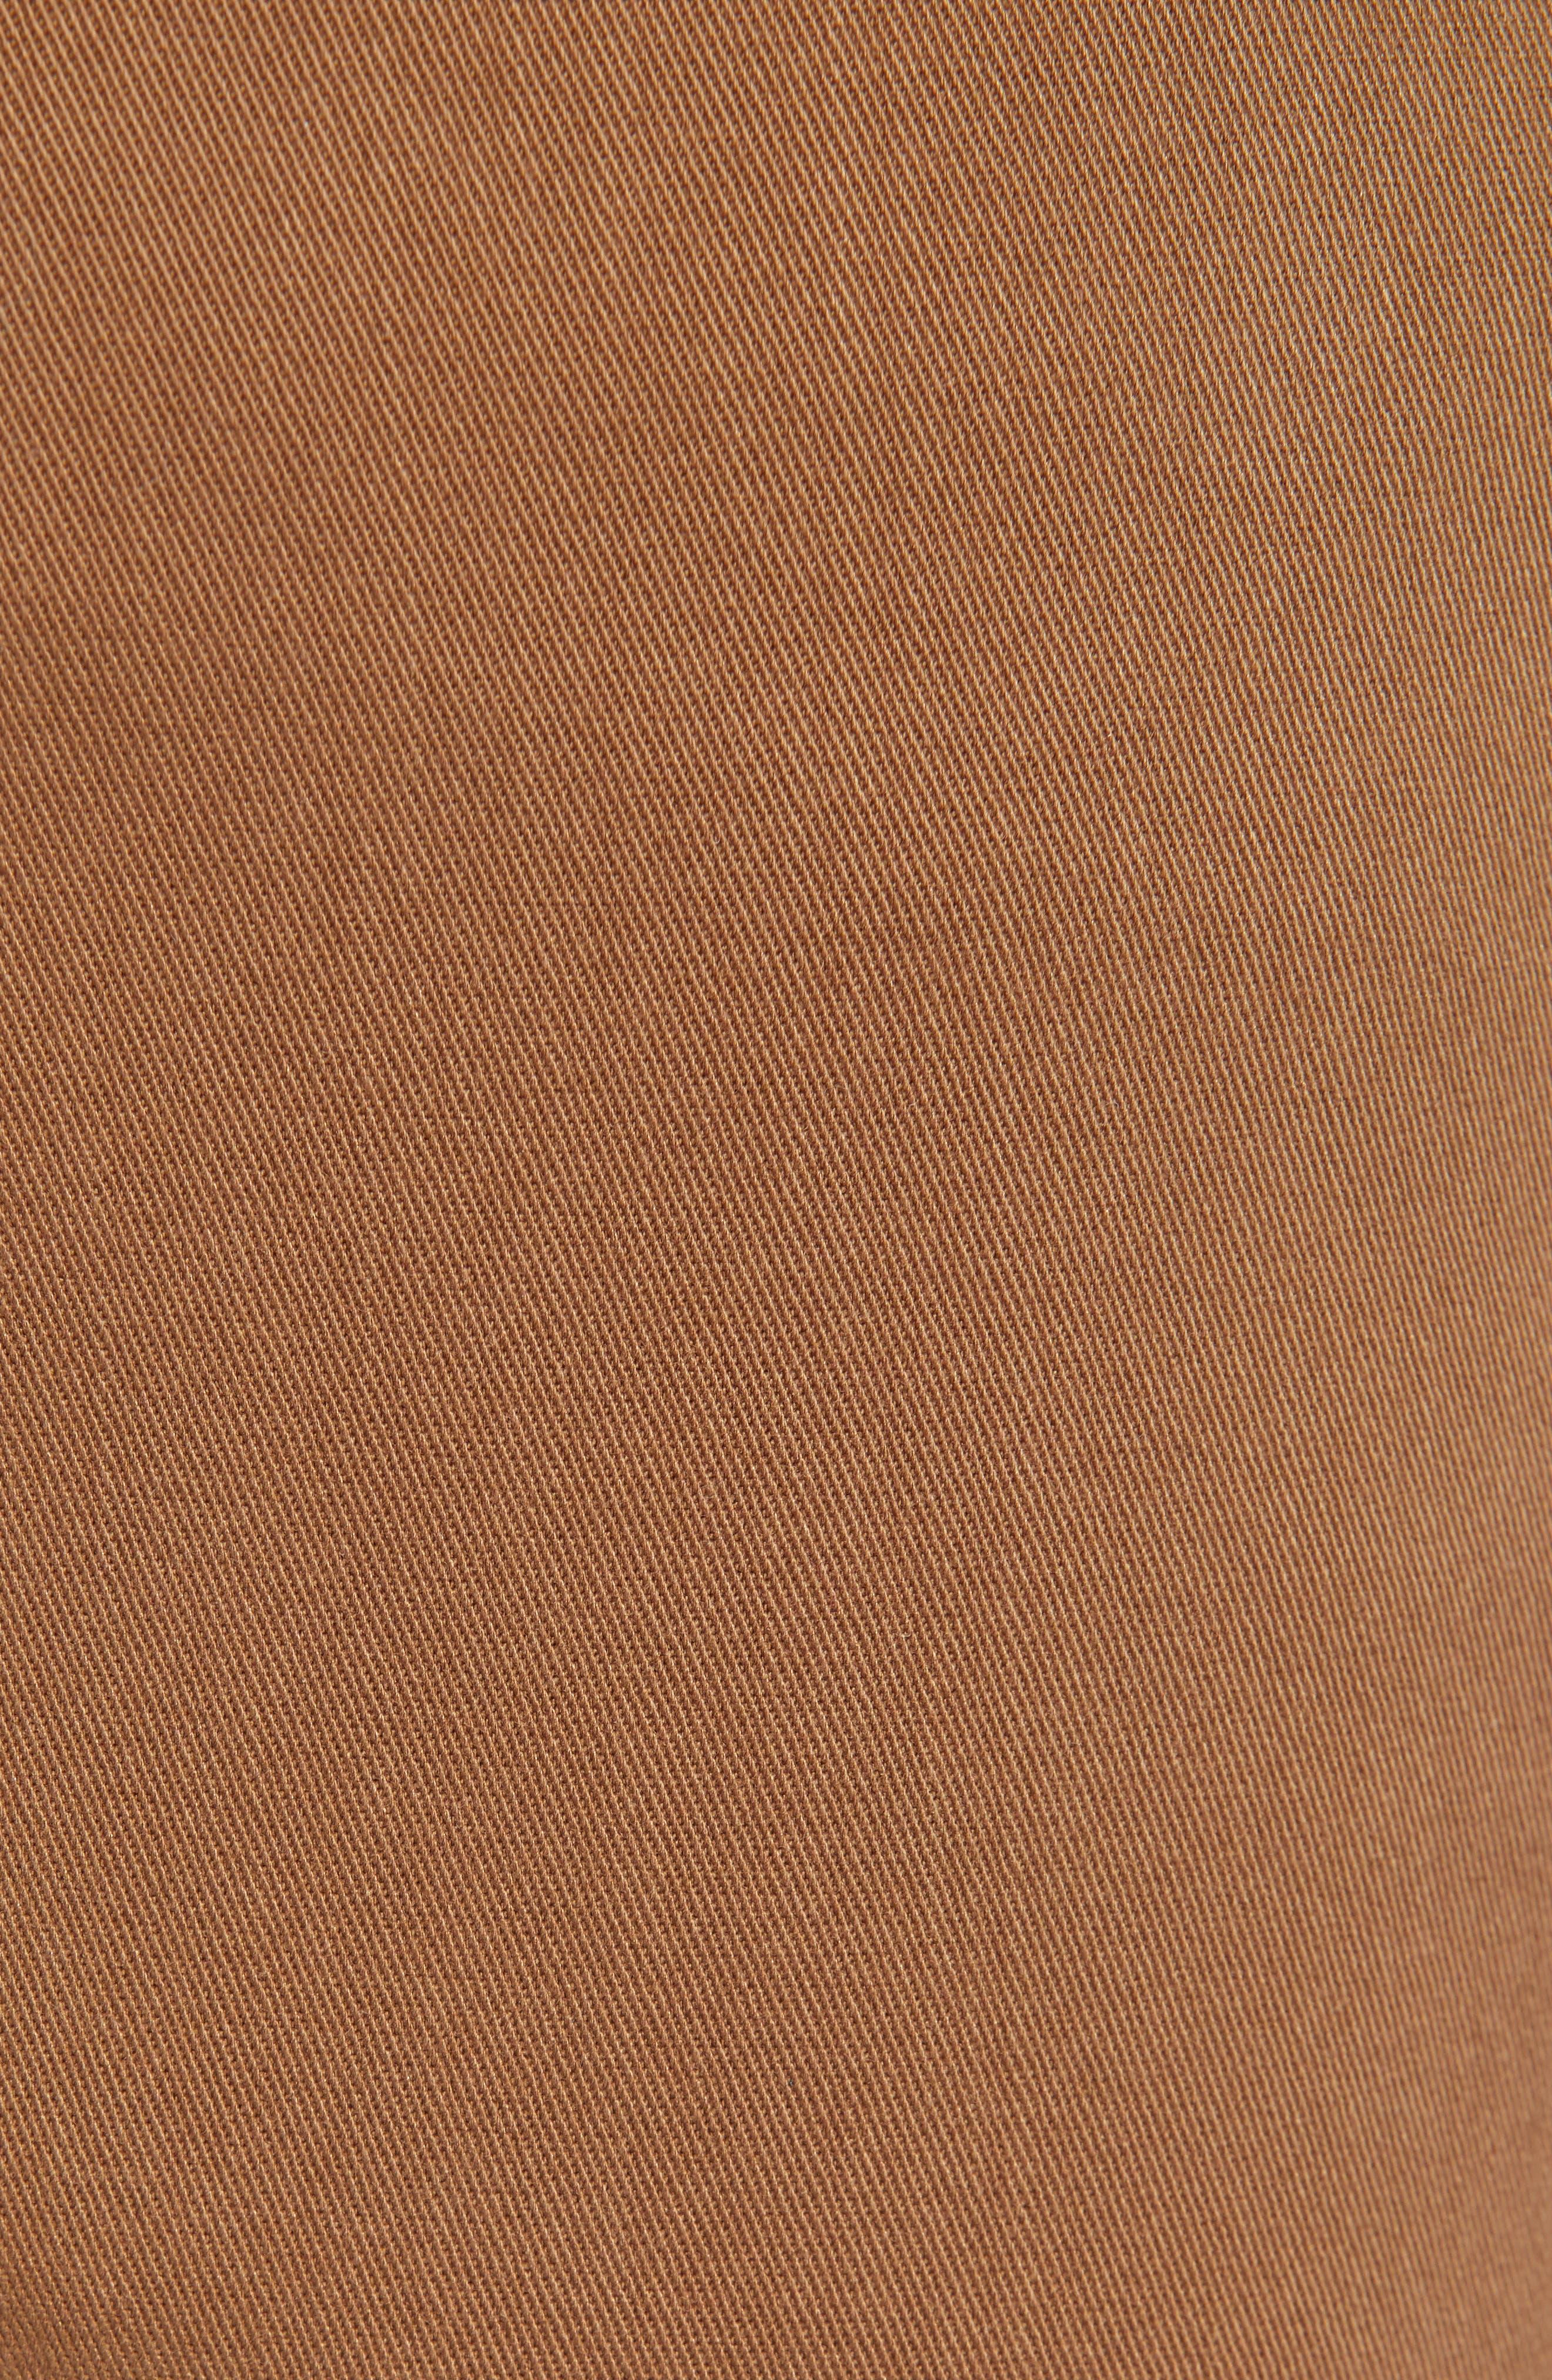 Hudson Blake Slim Fit Jeans,                             Alternate thumbnail 5, color,                             SIENNA